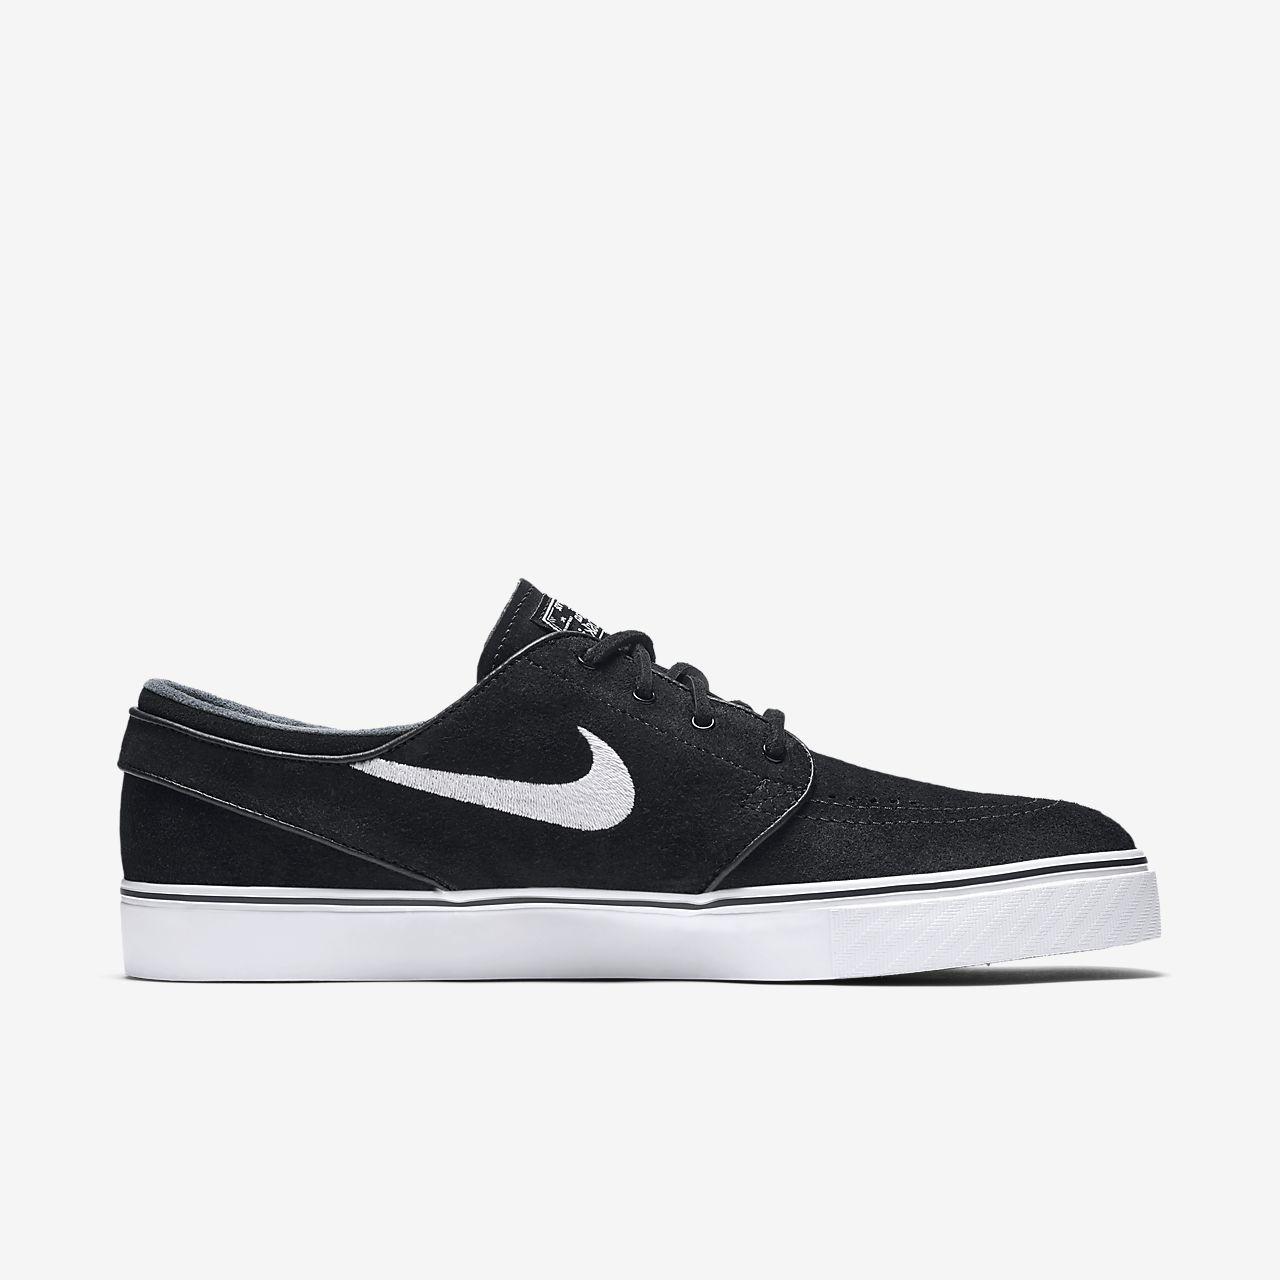 ... Calzado de skateboarding para hombre Nike SB Zoom Stefan Janoski OG